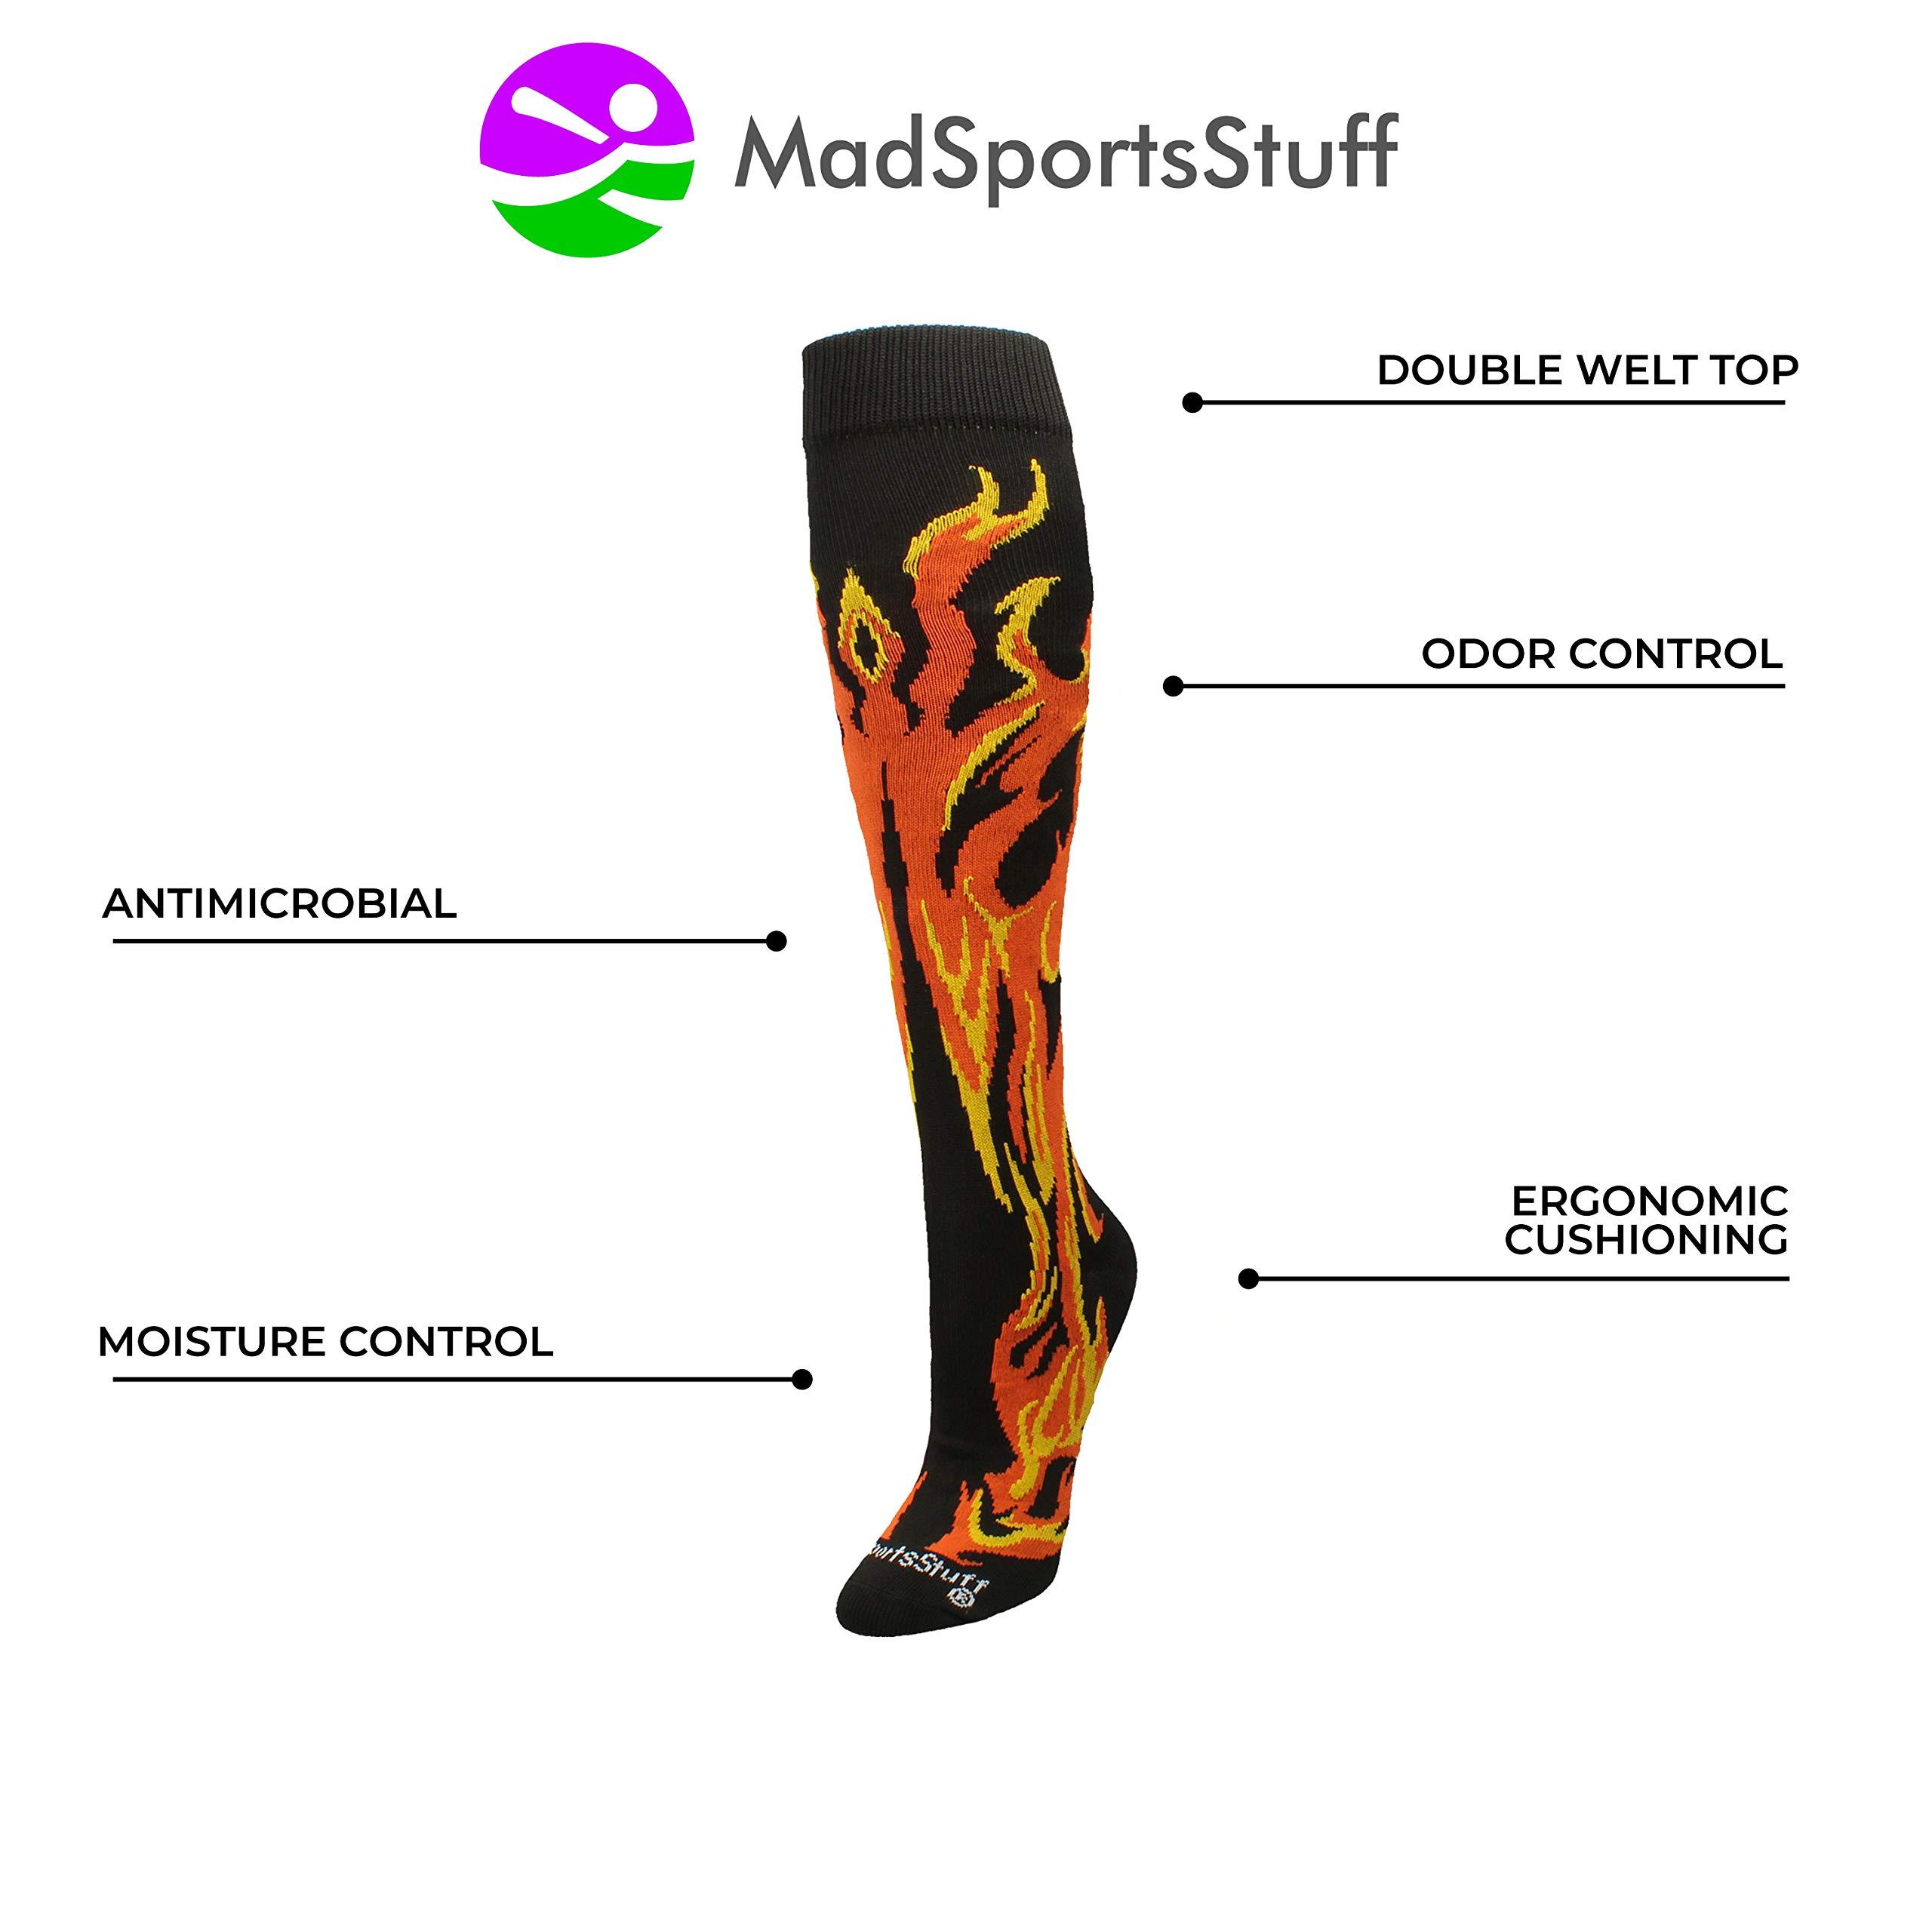 MadSportsStuff Flame Socks Athletic Over The Calf Socks (Black/Orange/Gold, Large) by MadSportsStuff (Image #3)